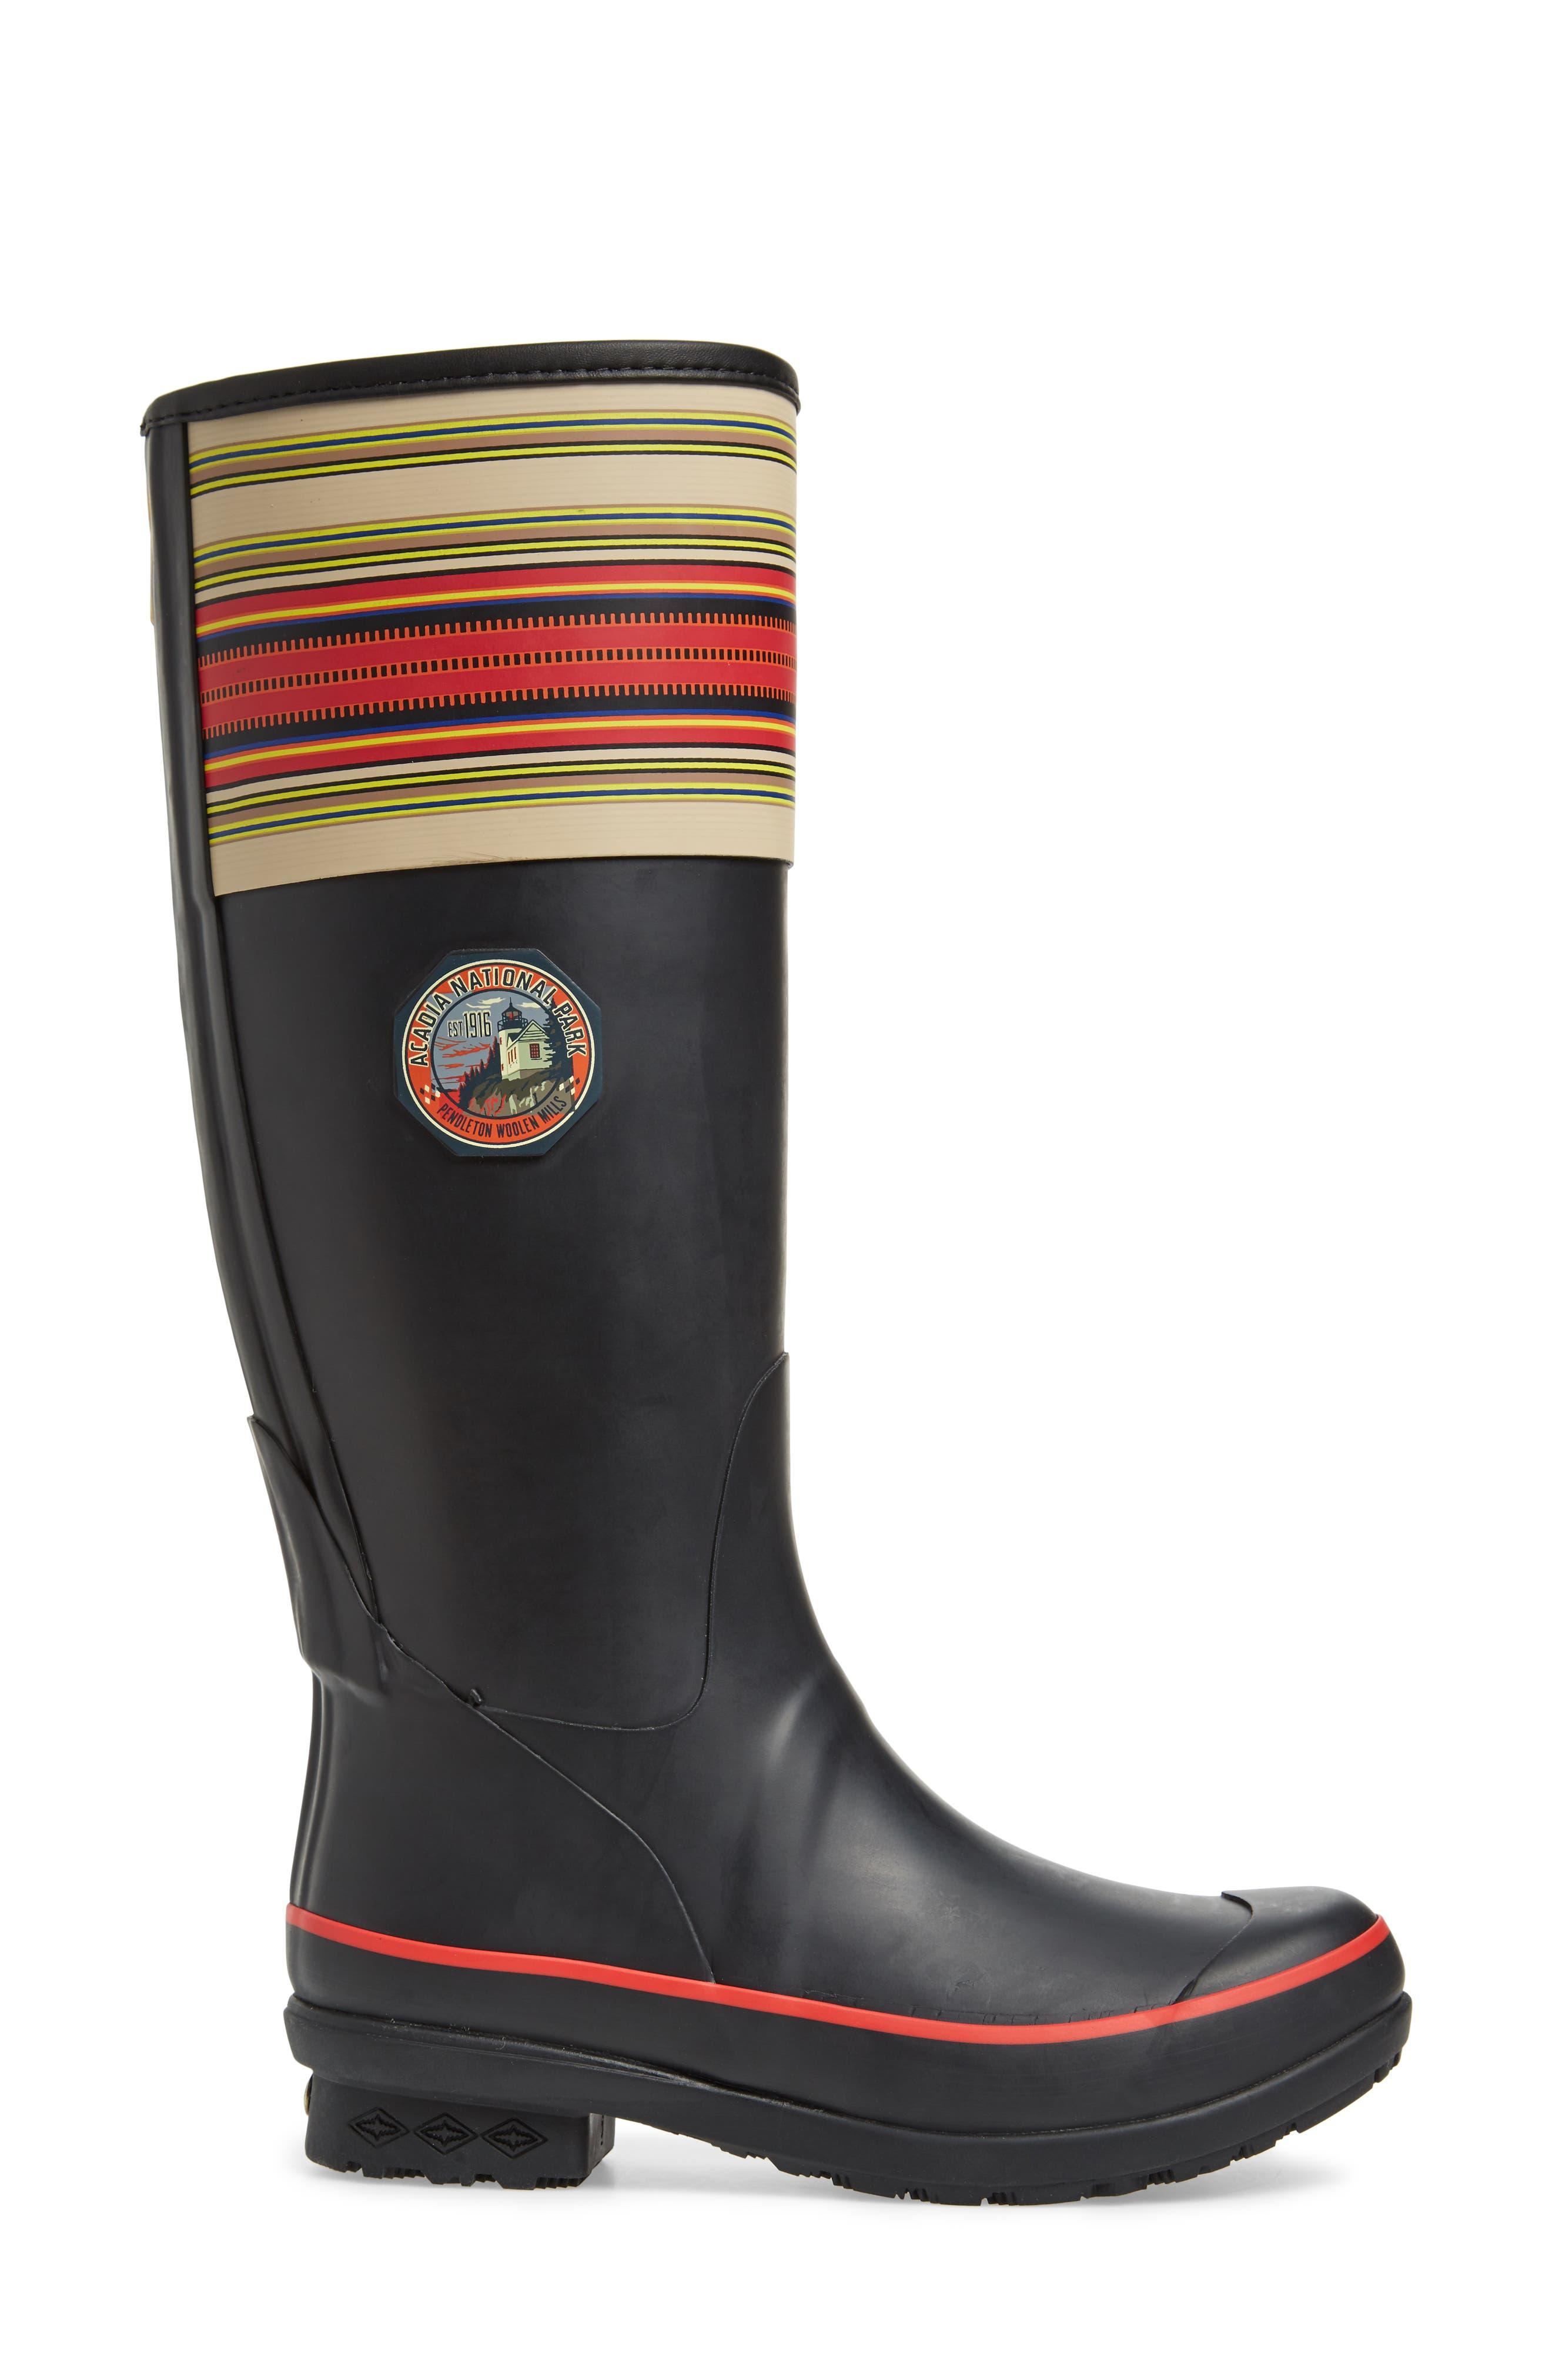 Pendleton Acadia National Park Tall Rain Boot,                             Alternate thumbnail 3, color,                             BLACK